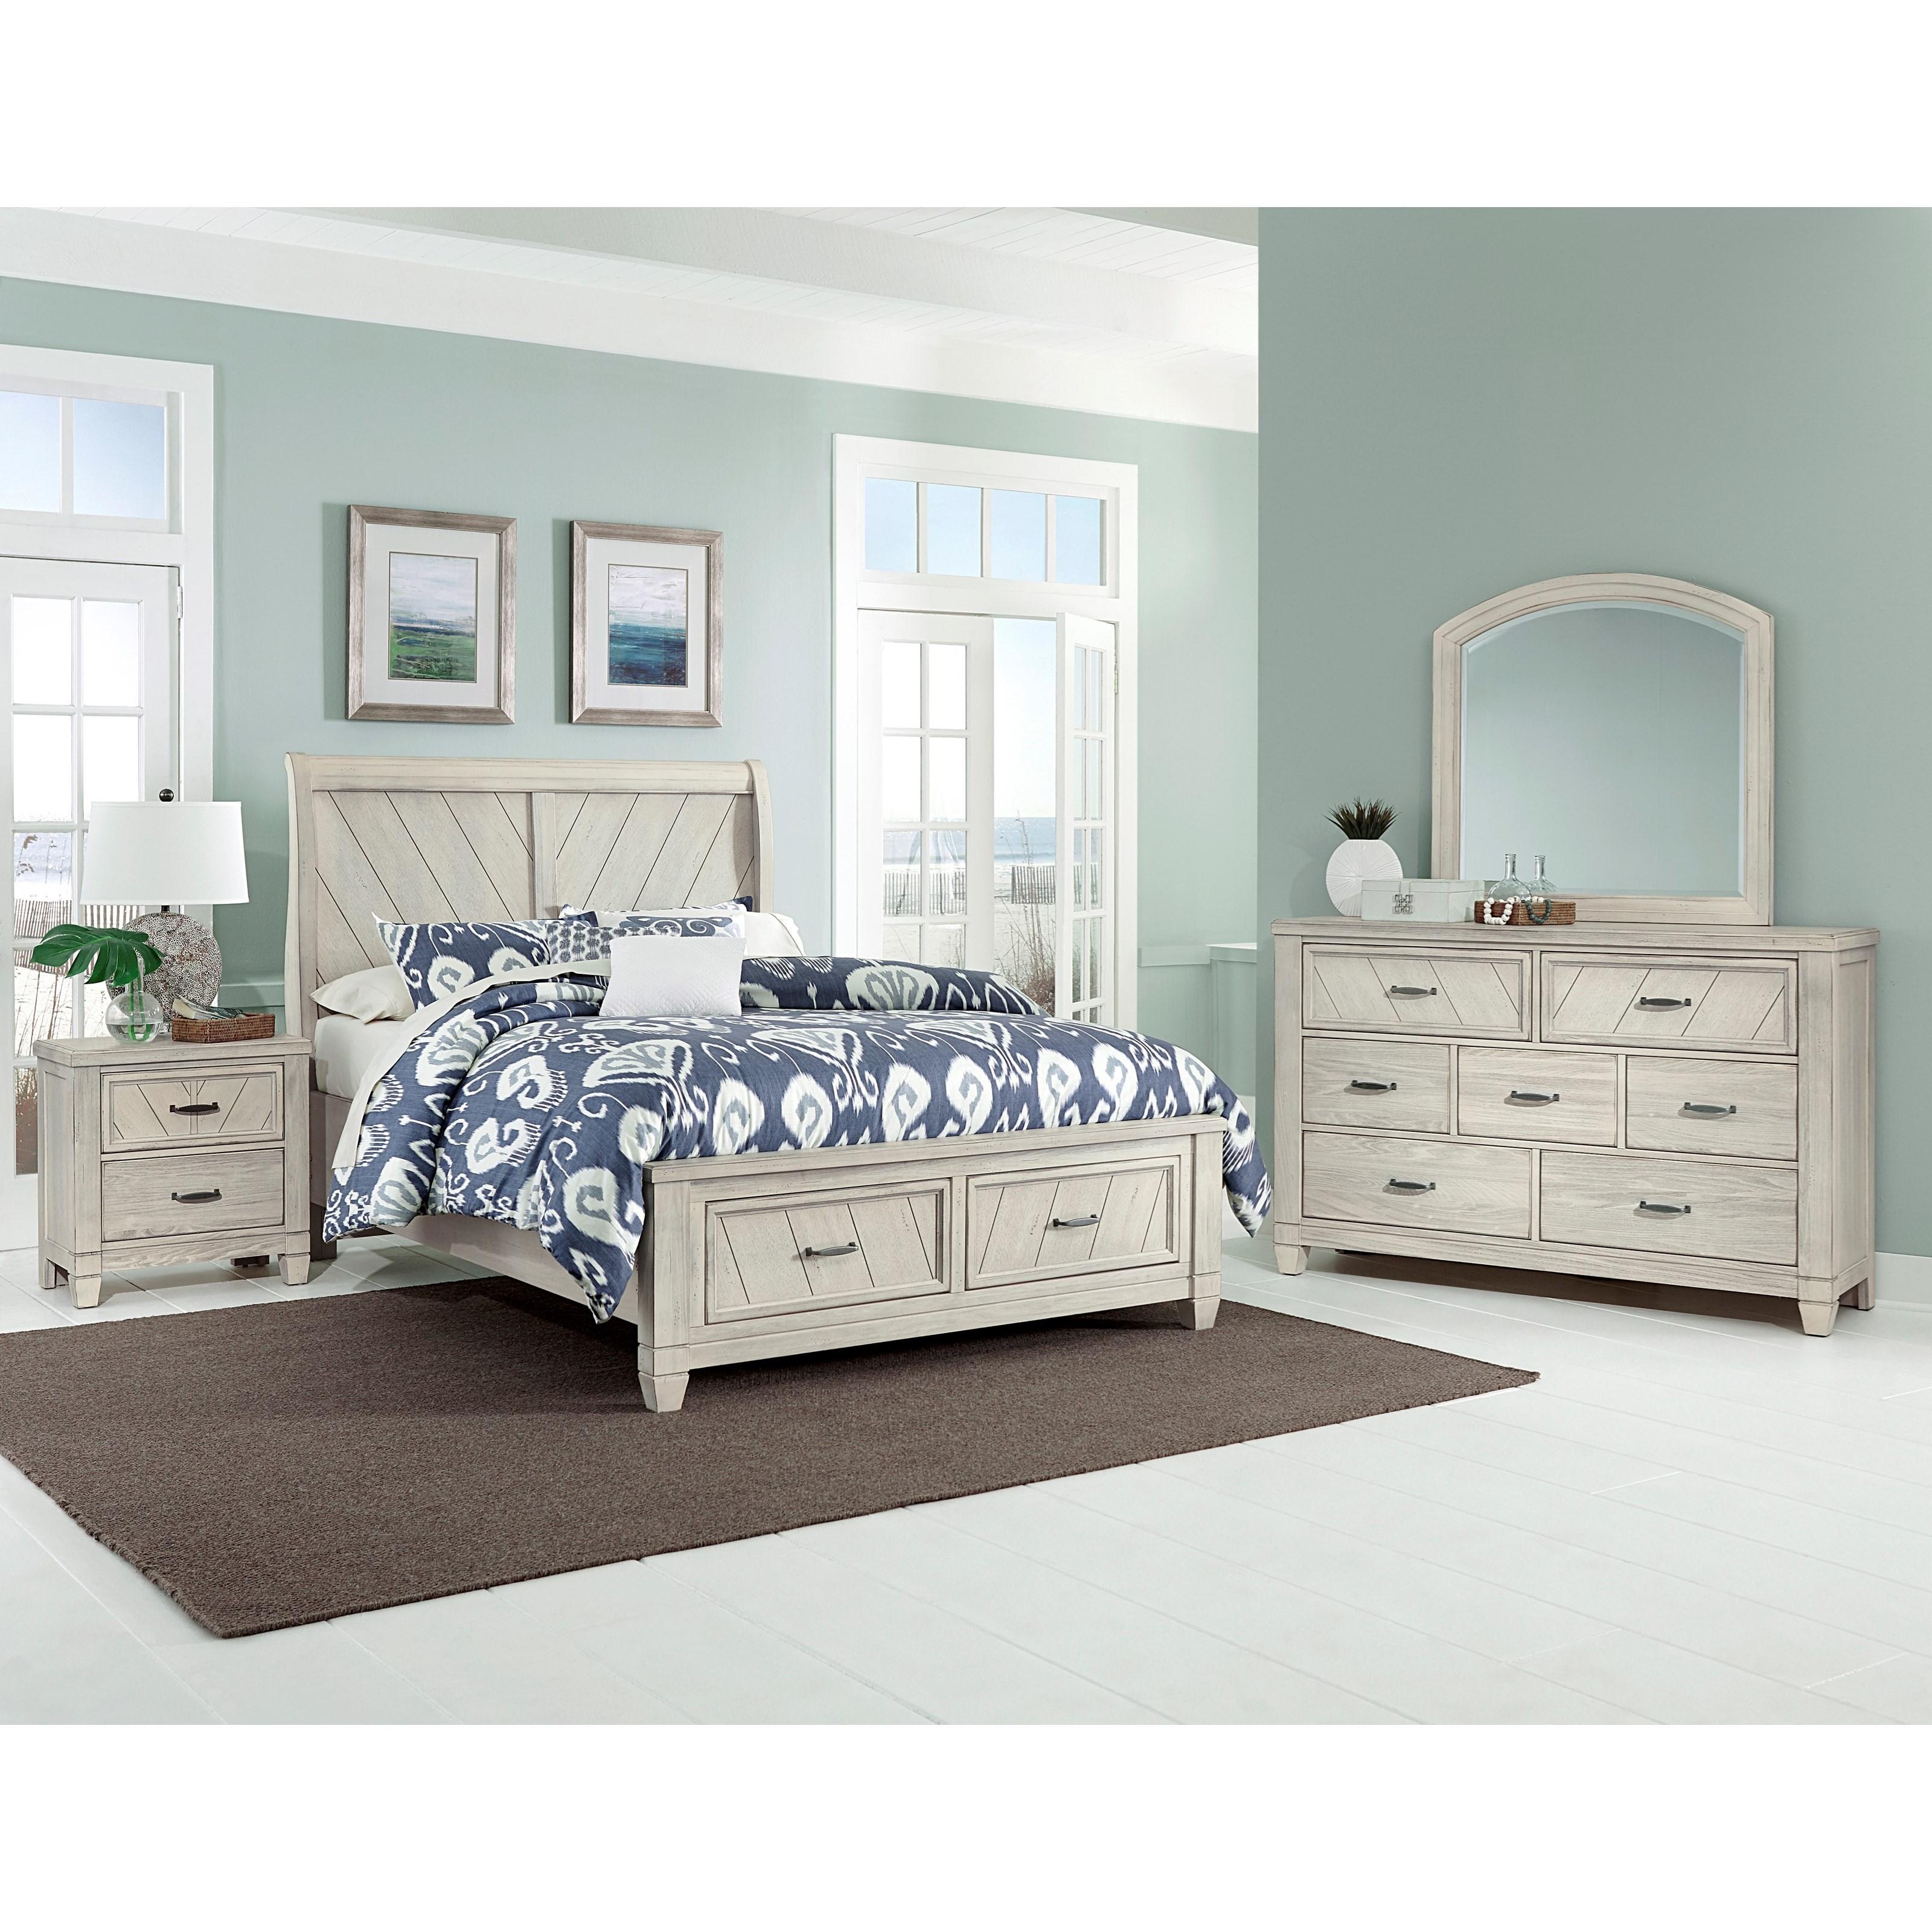 cottage queen bedroom group item number 644 q bedroom group 4